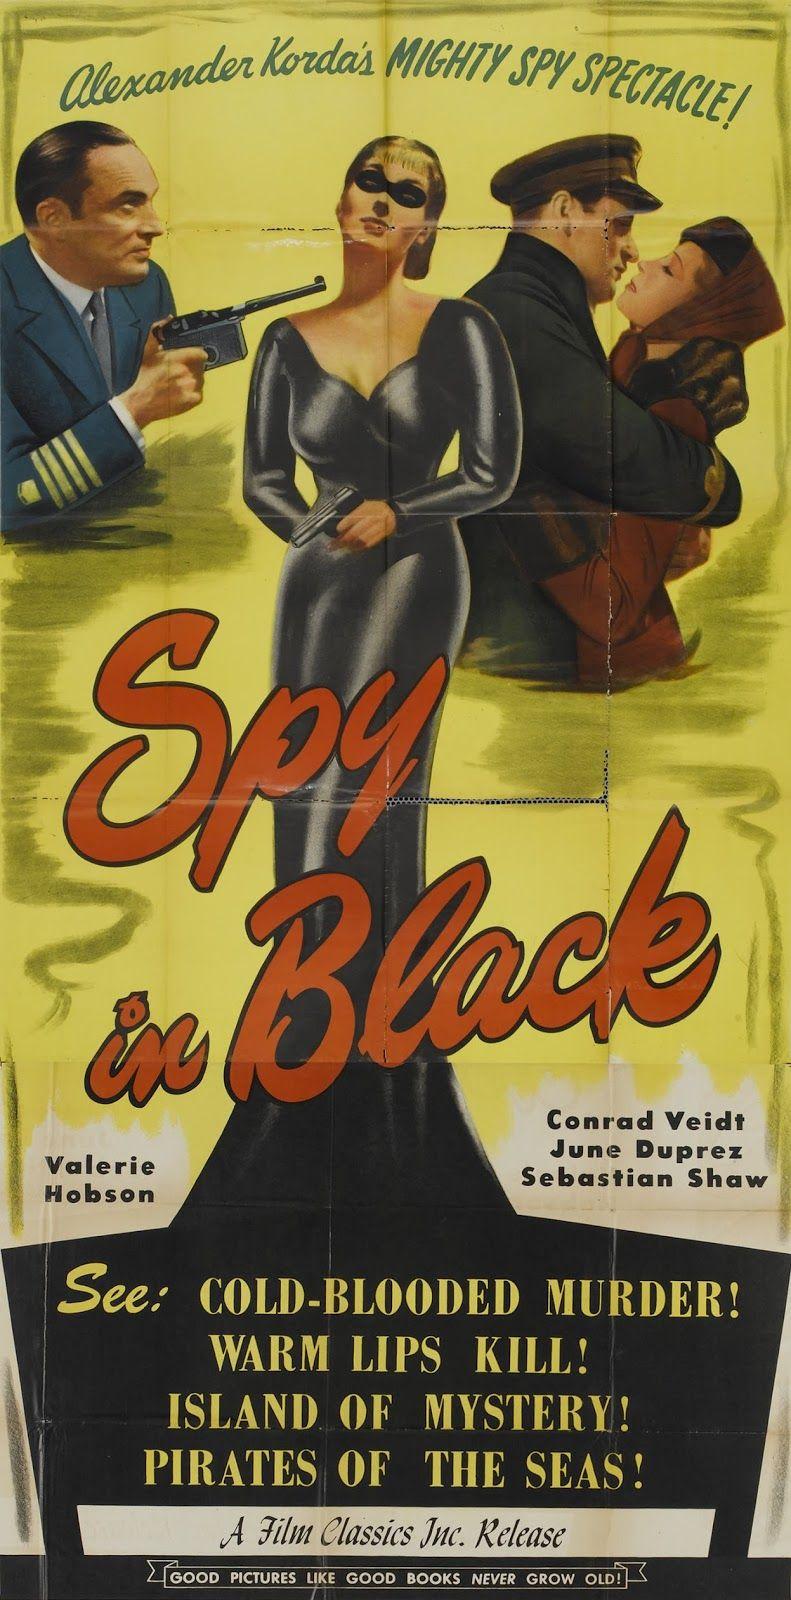 Olivia de Havilland, Rita Hayworth, Cary Grant, Jayne